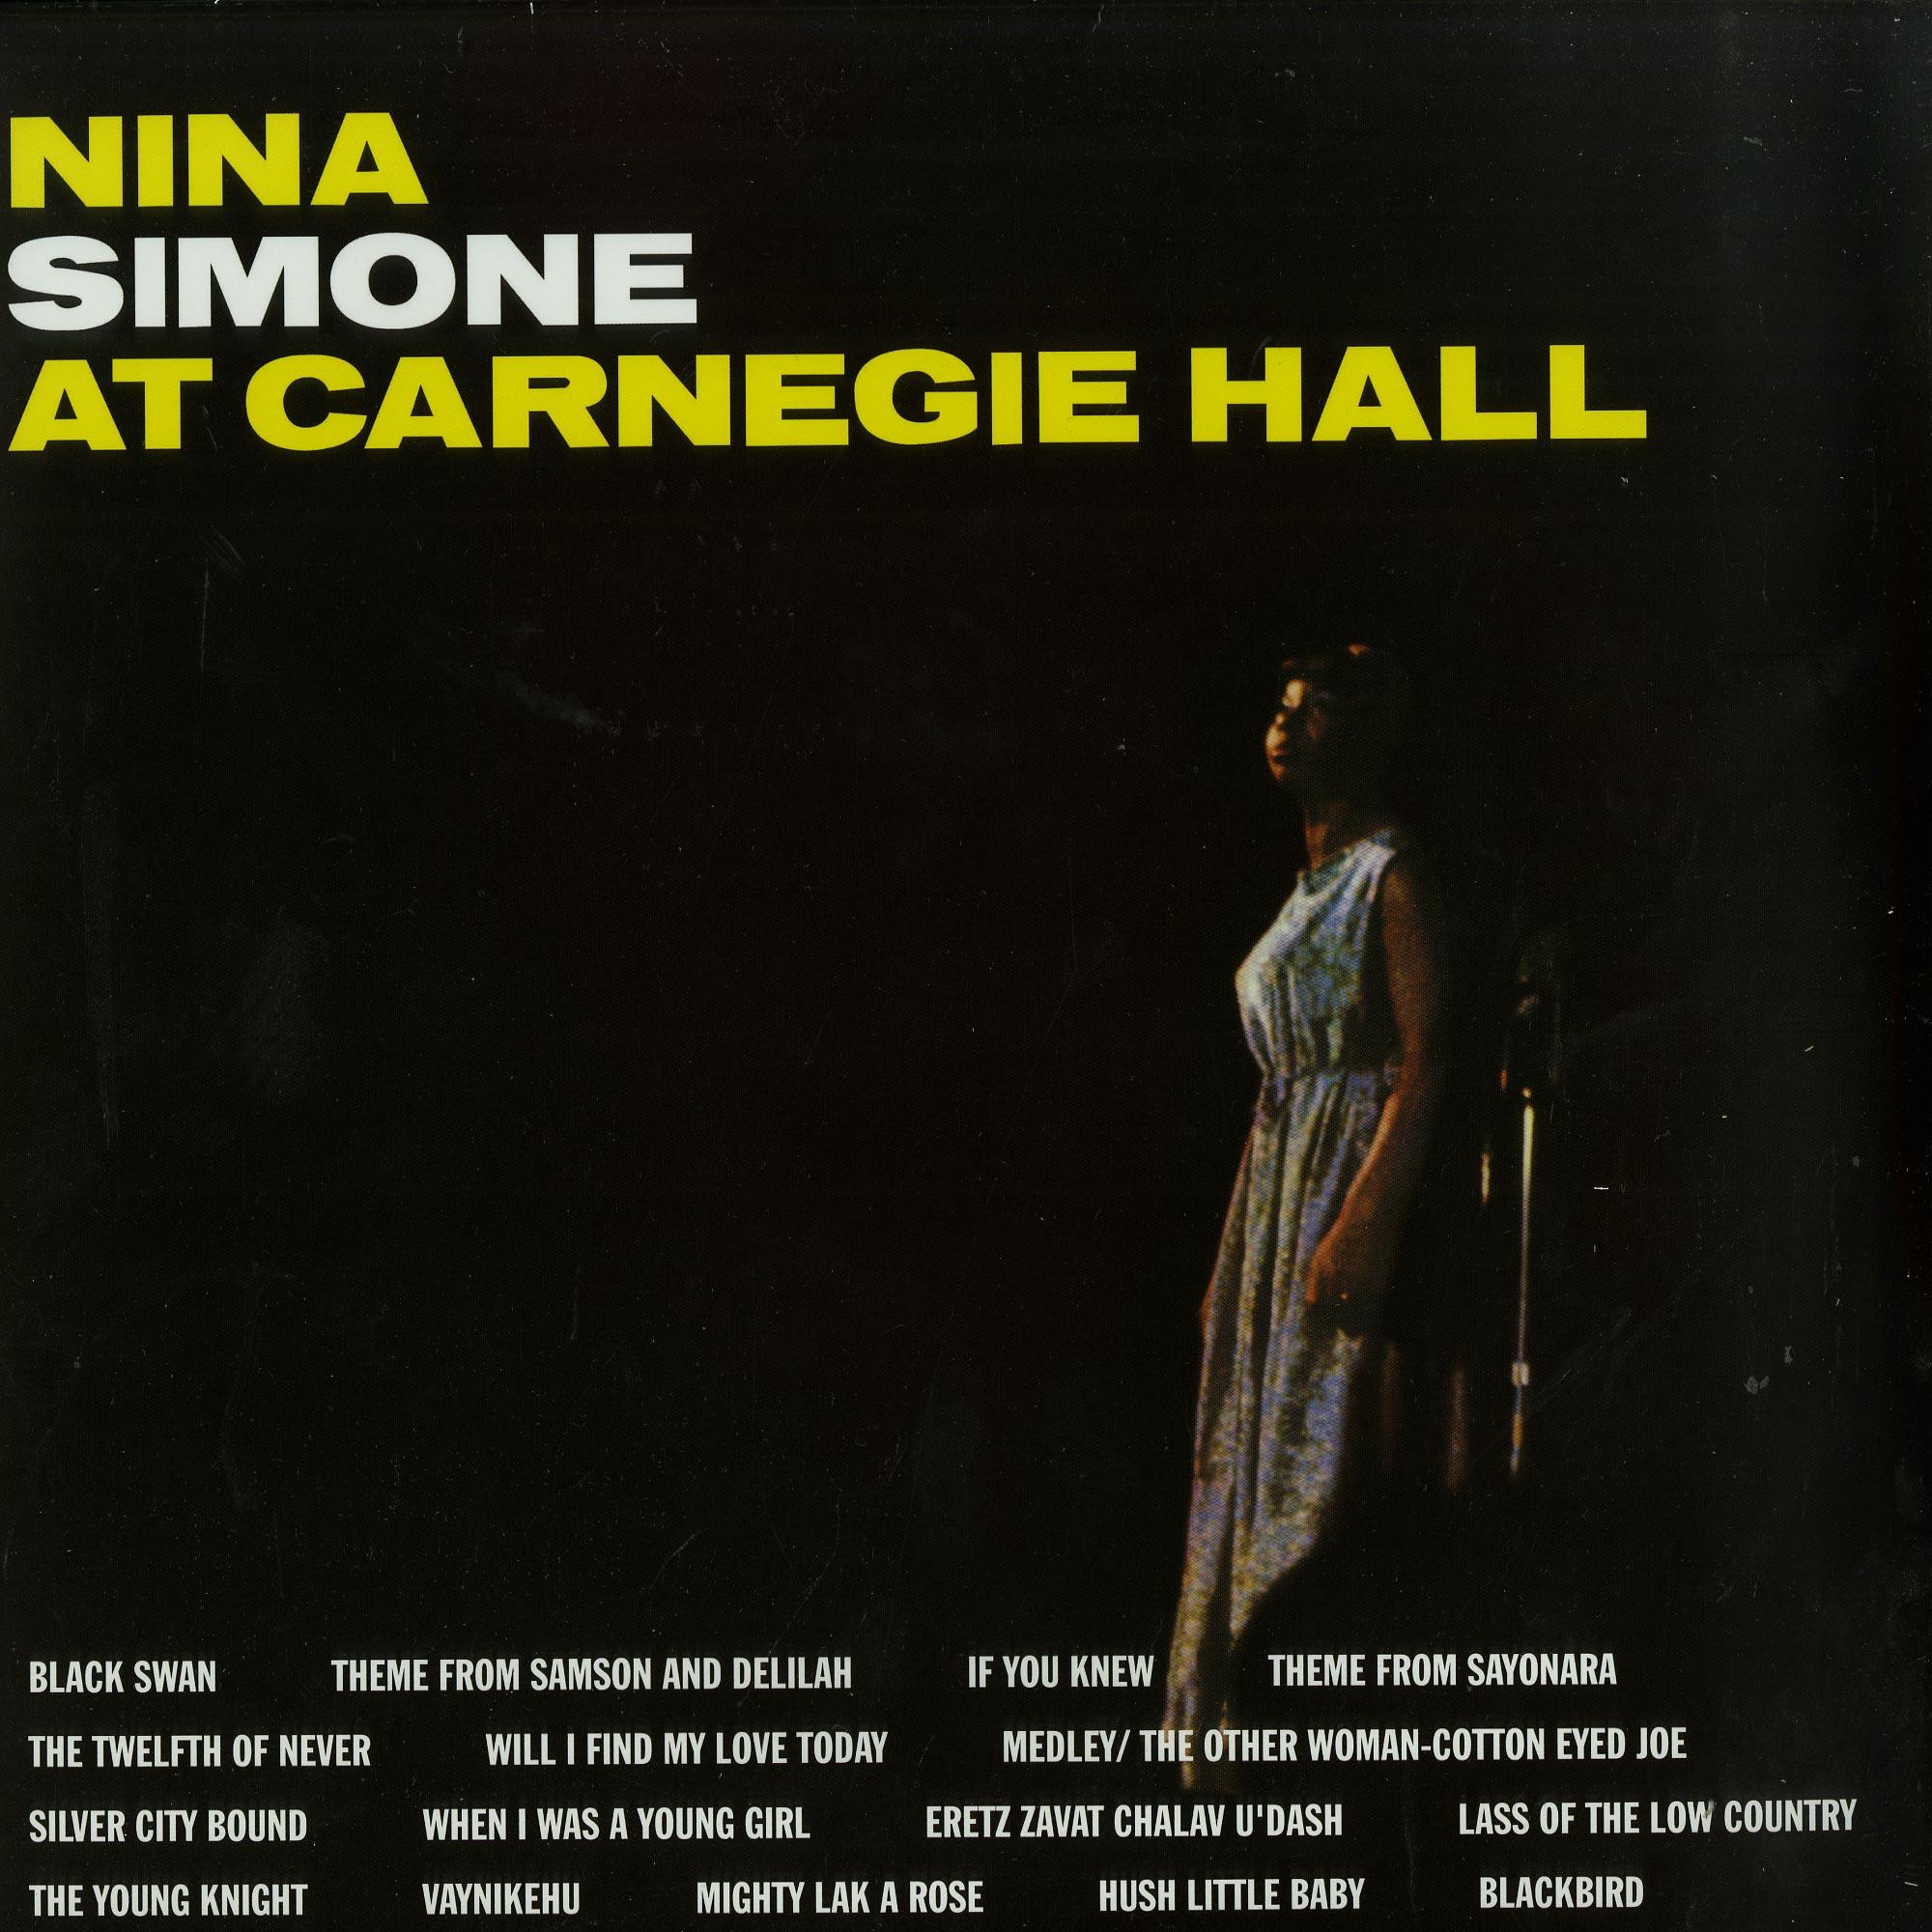 Nina Simone - AT CARNEGIE HALL